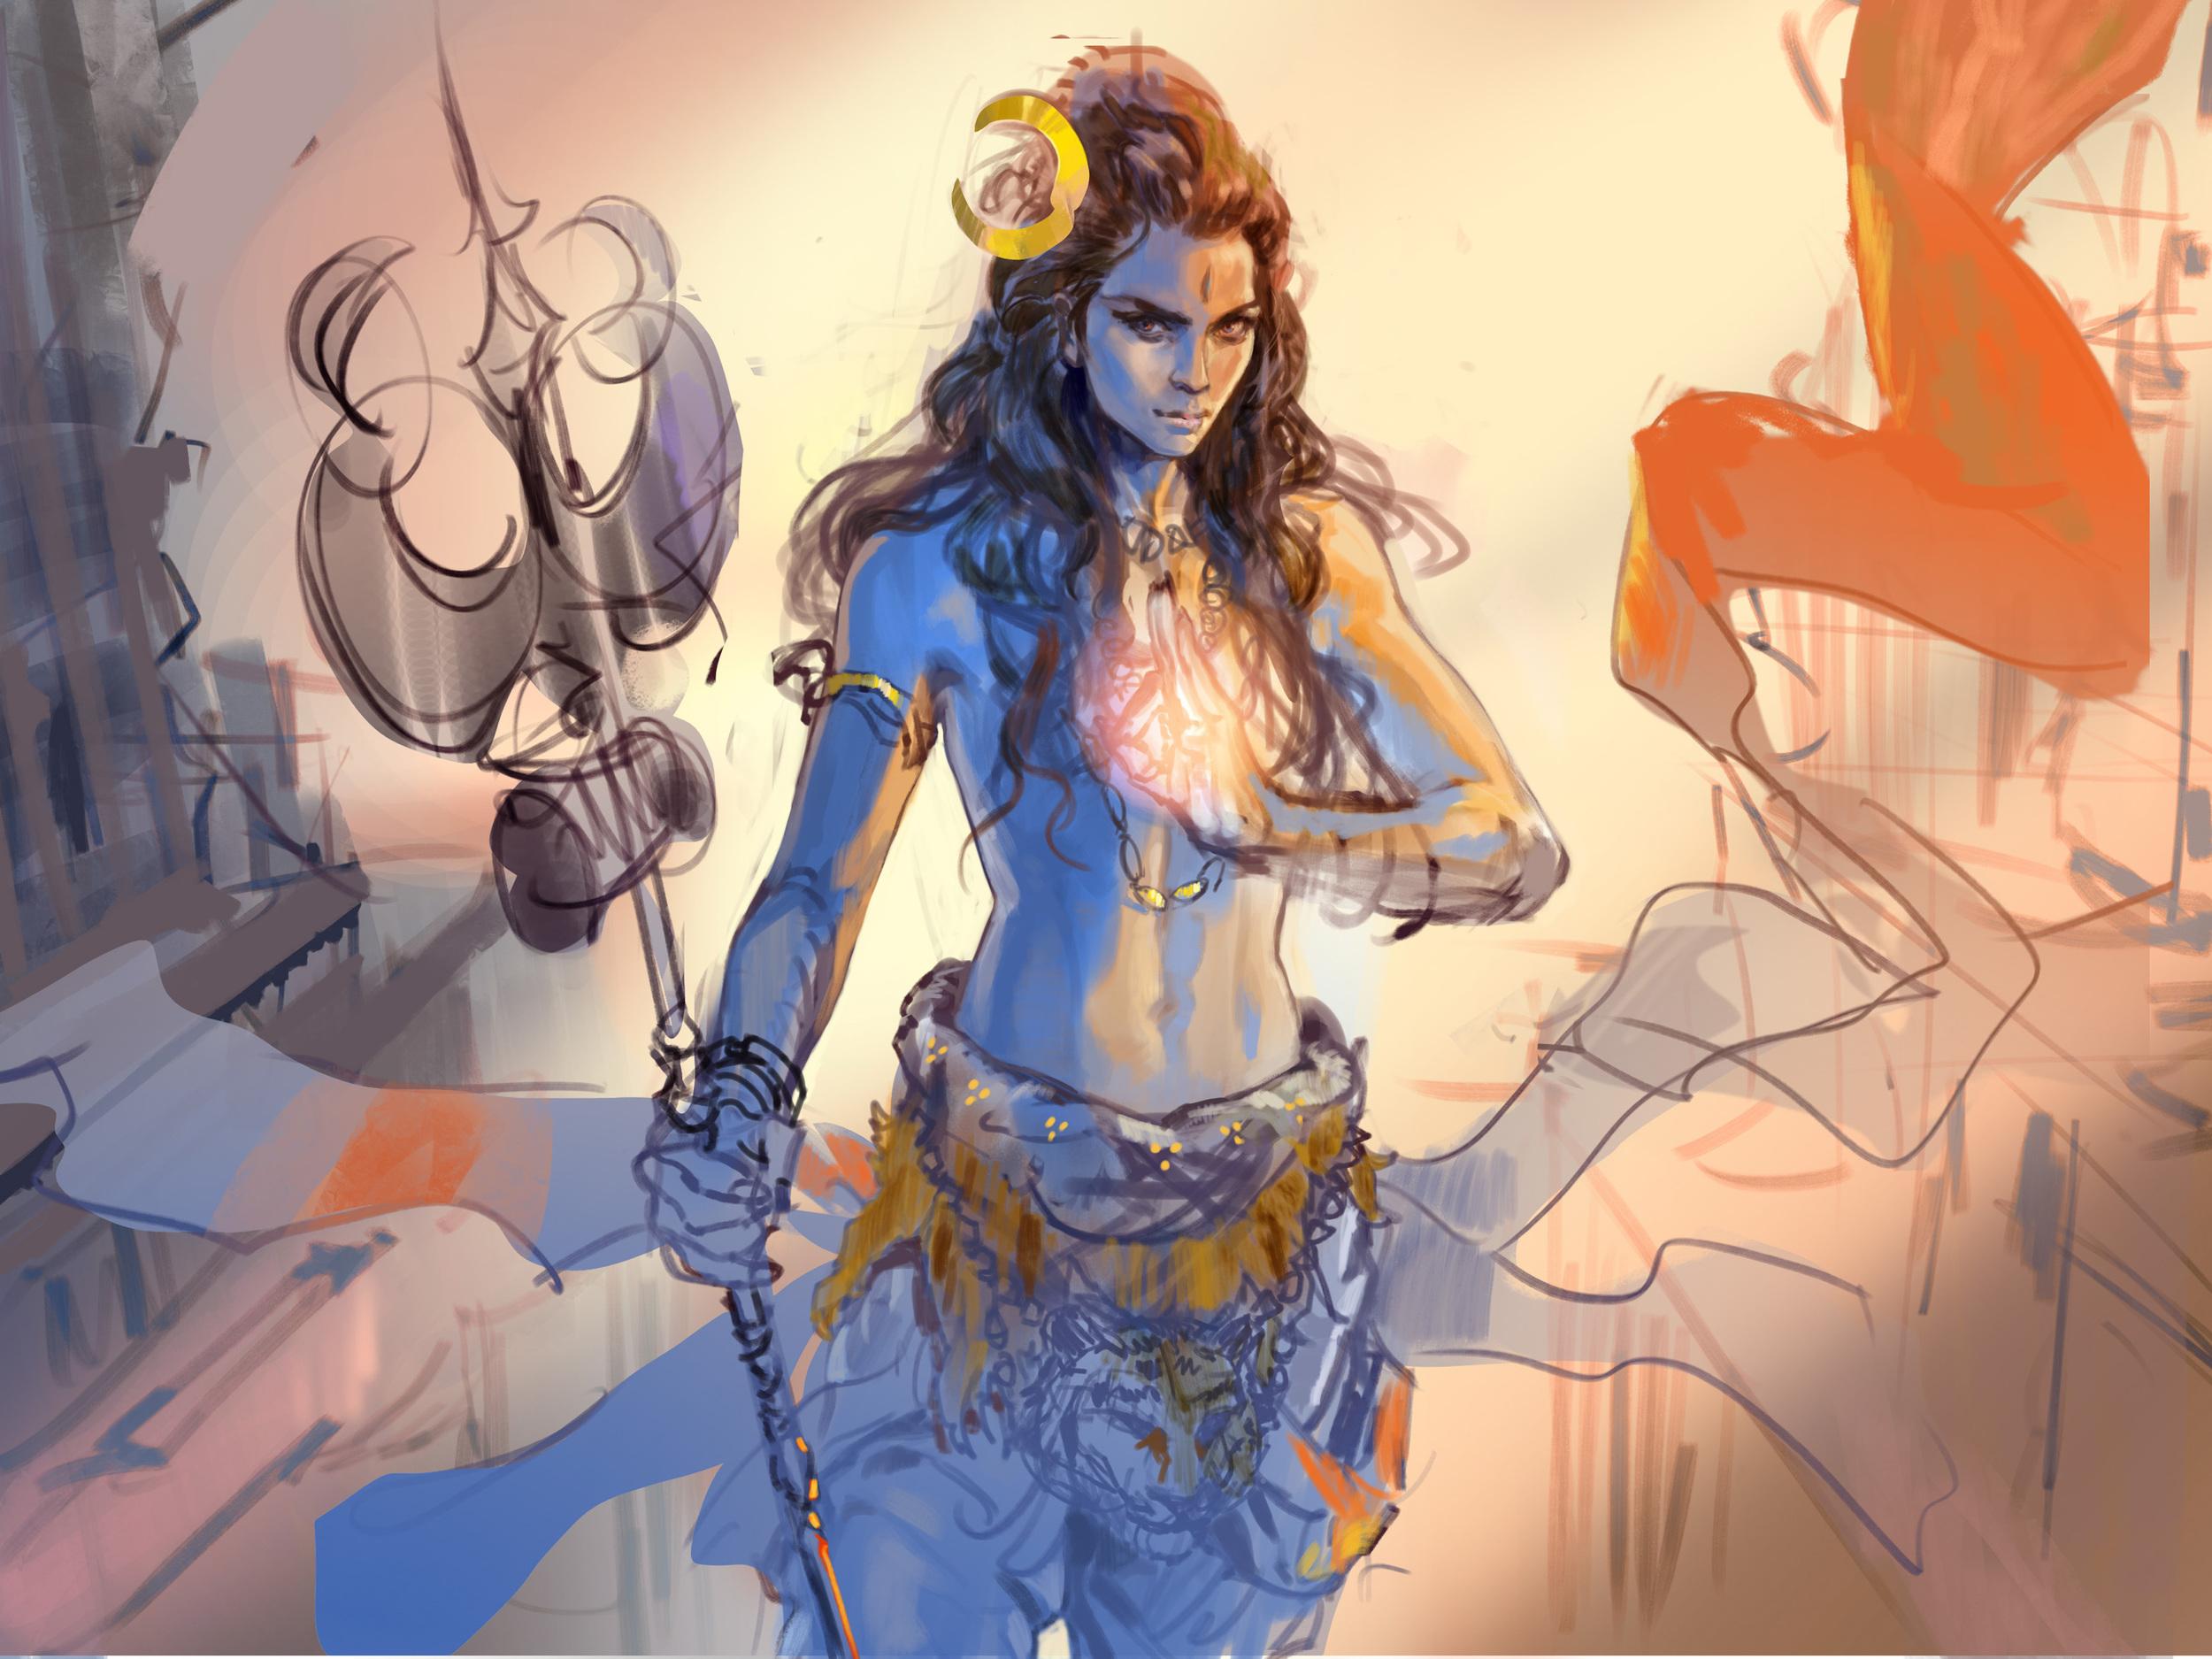 Shiva_ColorSketch_v01-wip2.jpg